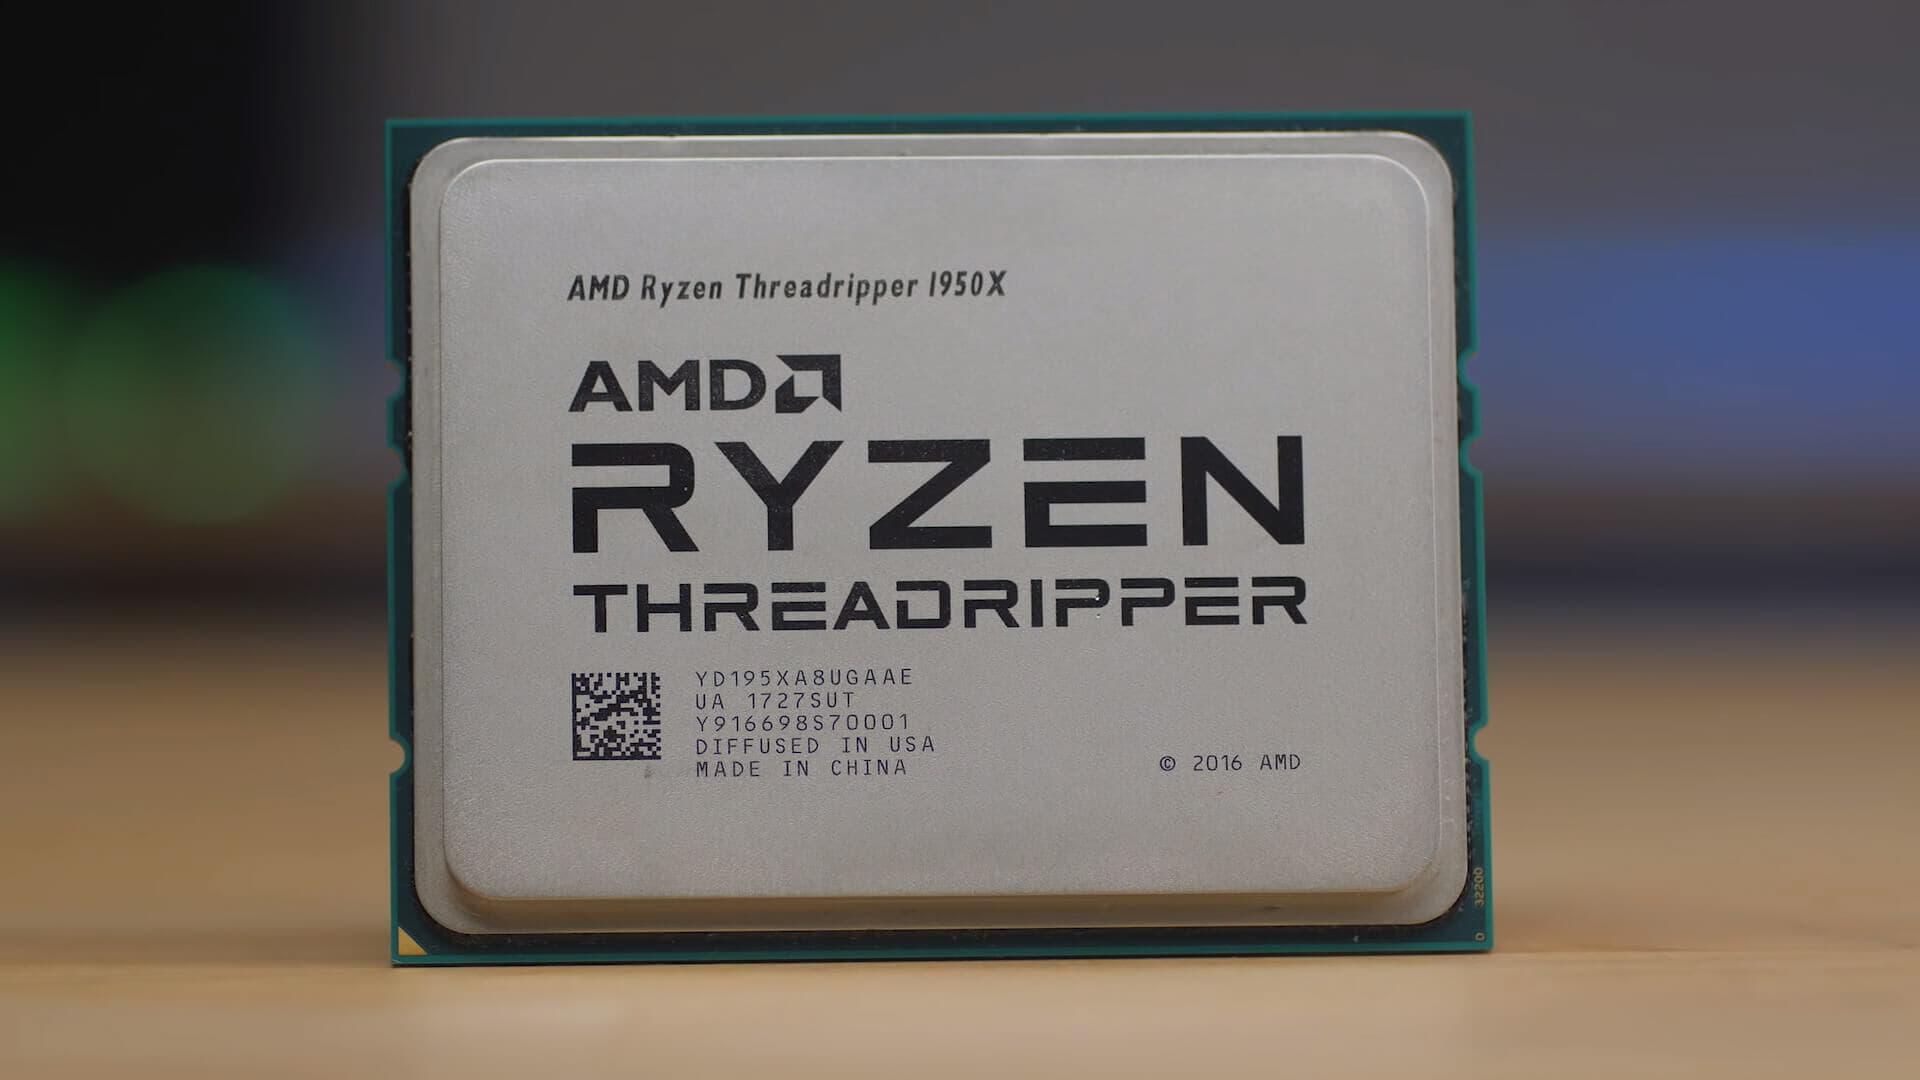 AMD-Ryzen-Threadripper-1950X-Processor-With-16-Cores-And-32-Threads